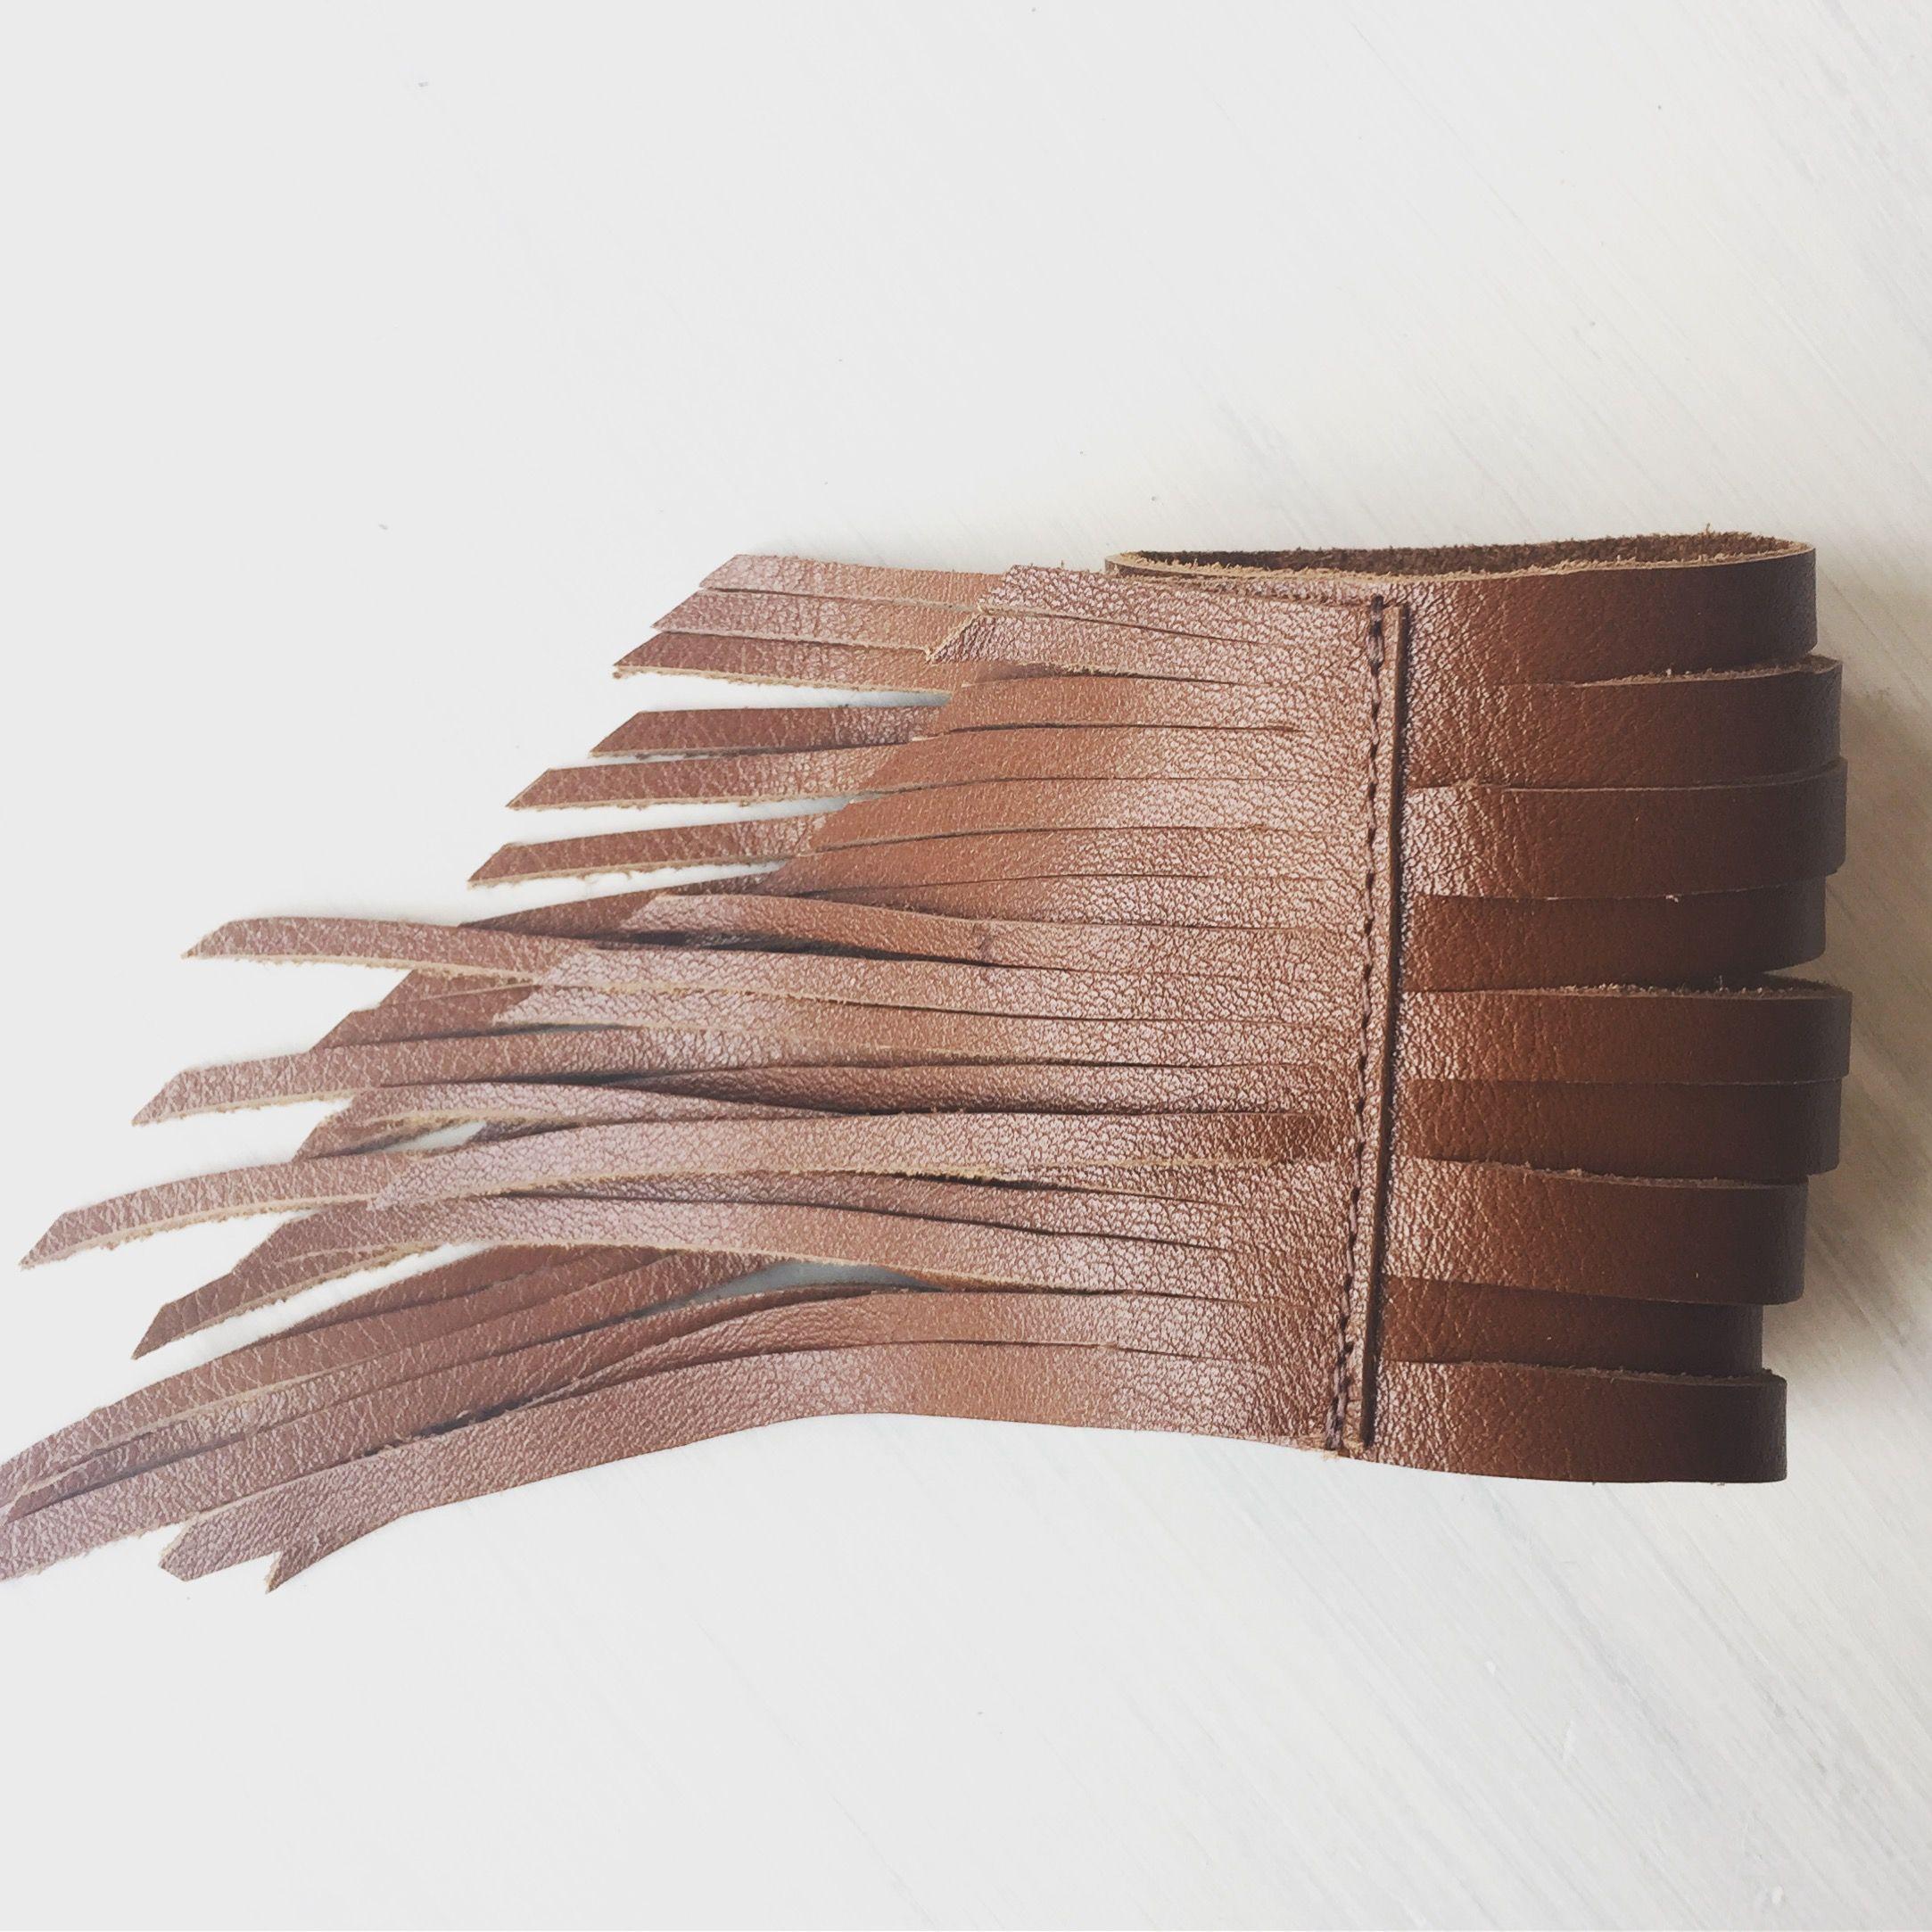 Free Spirit Leather Fringe Cuff